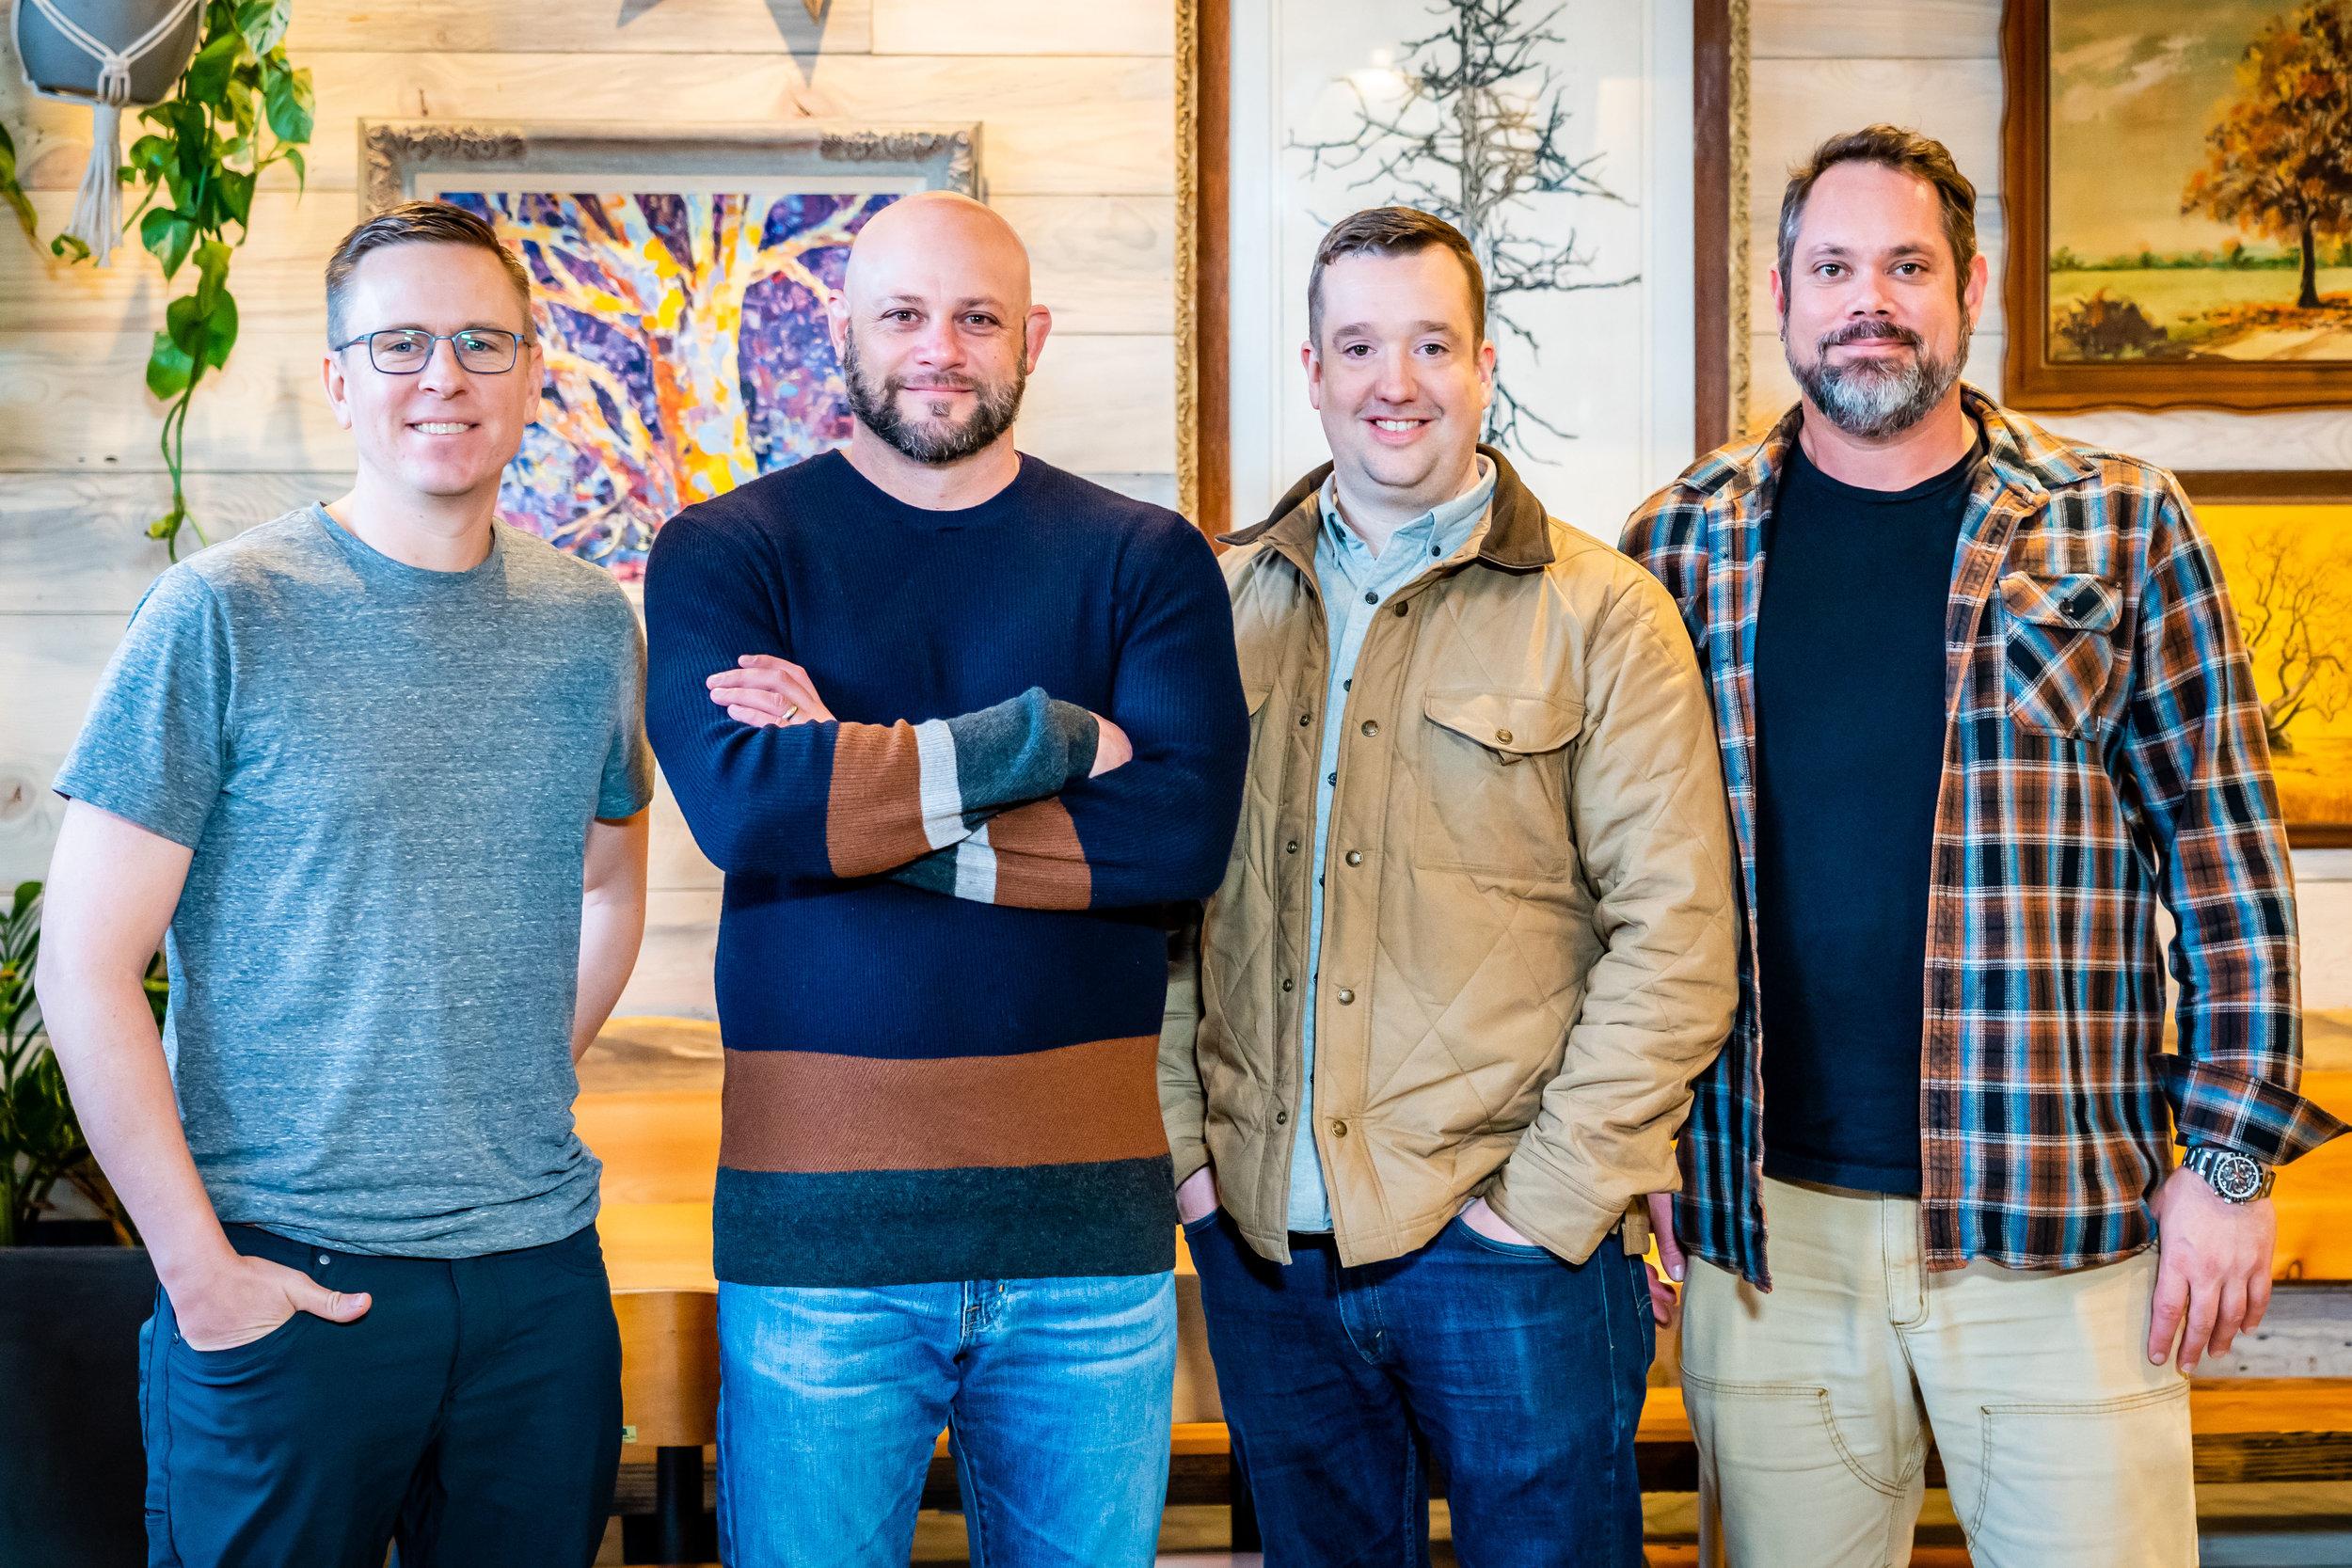 (Left to Right) David Kreifels, Jason Owens, Benjamin Bettinger, Ben Dyer